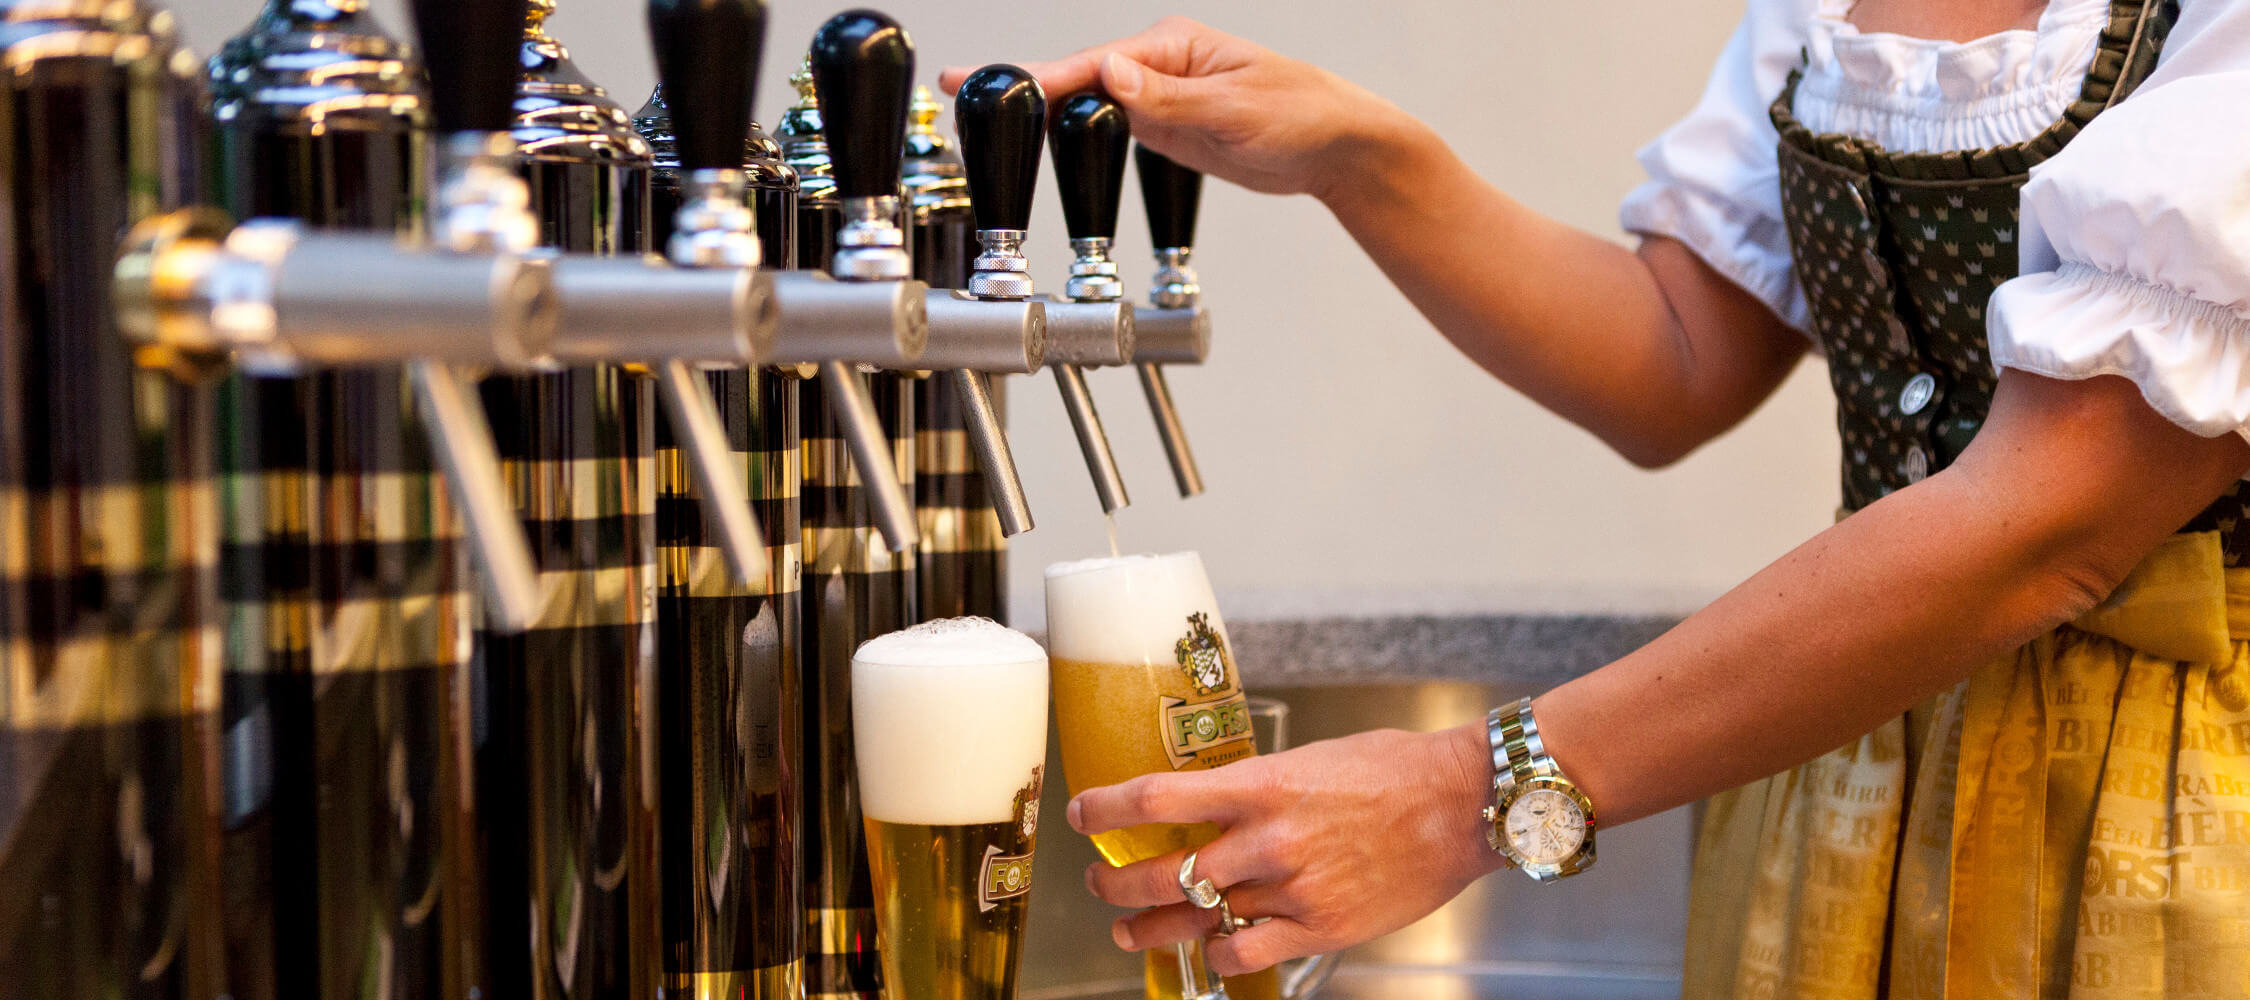 Italien-Trentino_Suedtirol_Alto_Adige_Merano_Meran_Besichtigen_Produkte_Drinks_Bier_Brauerei_MGM-Damian-Lukas-Pertoll_mgm01051mgm_2250x1000